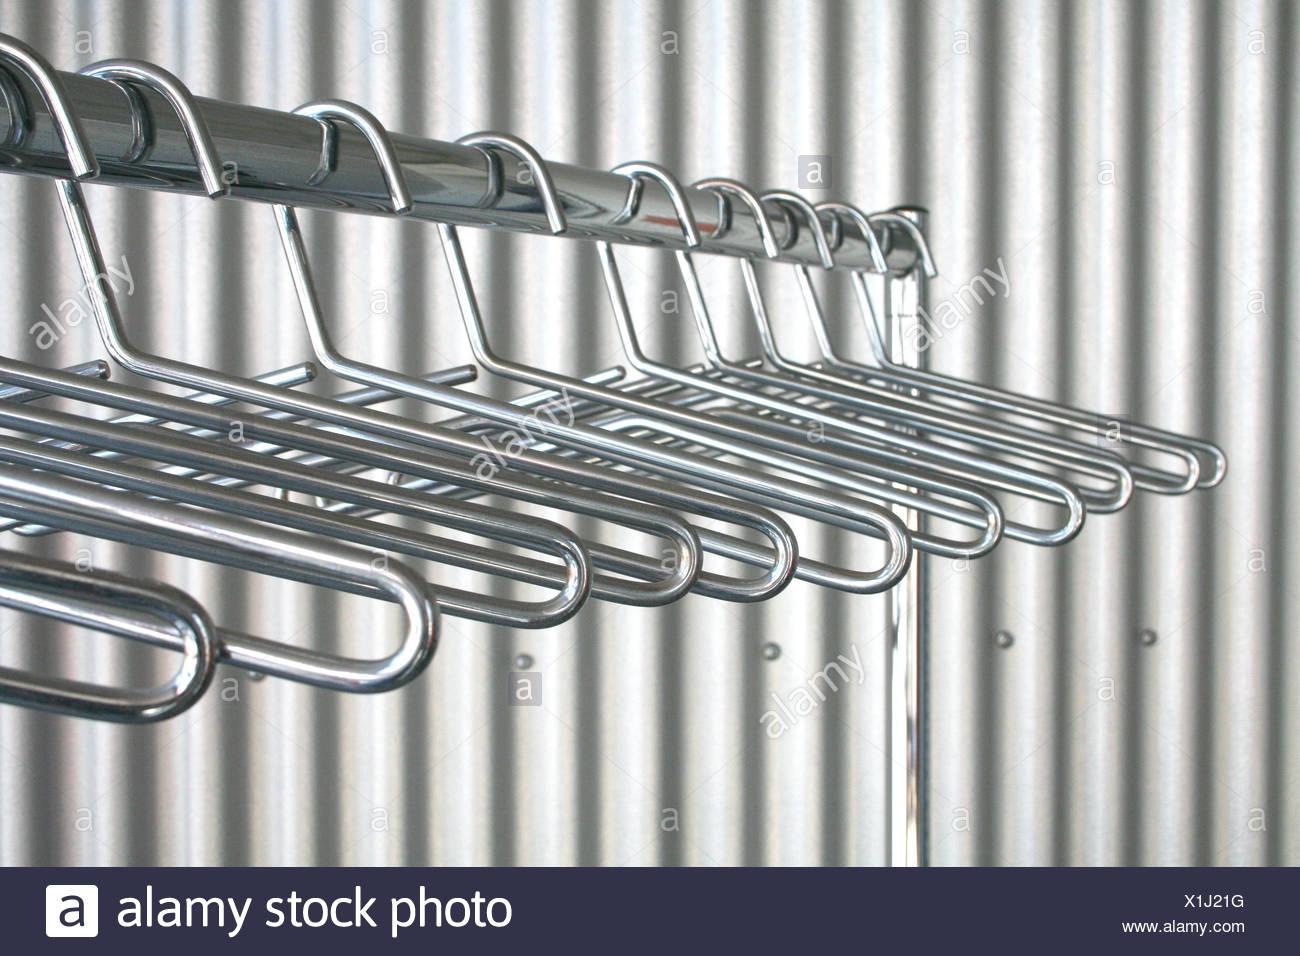 perspective prospect sheet metal hanger order chromium